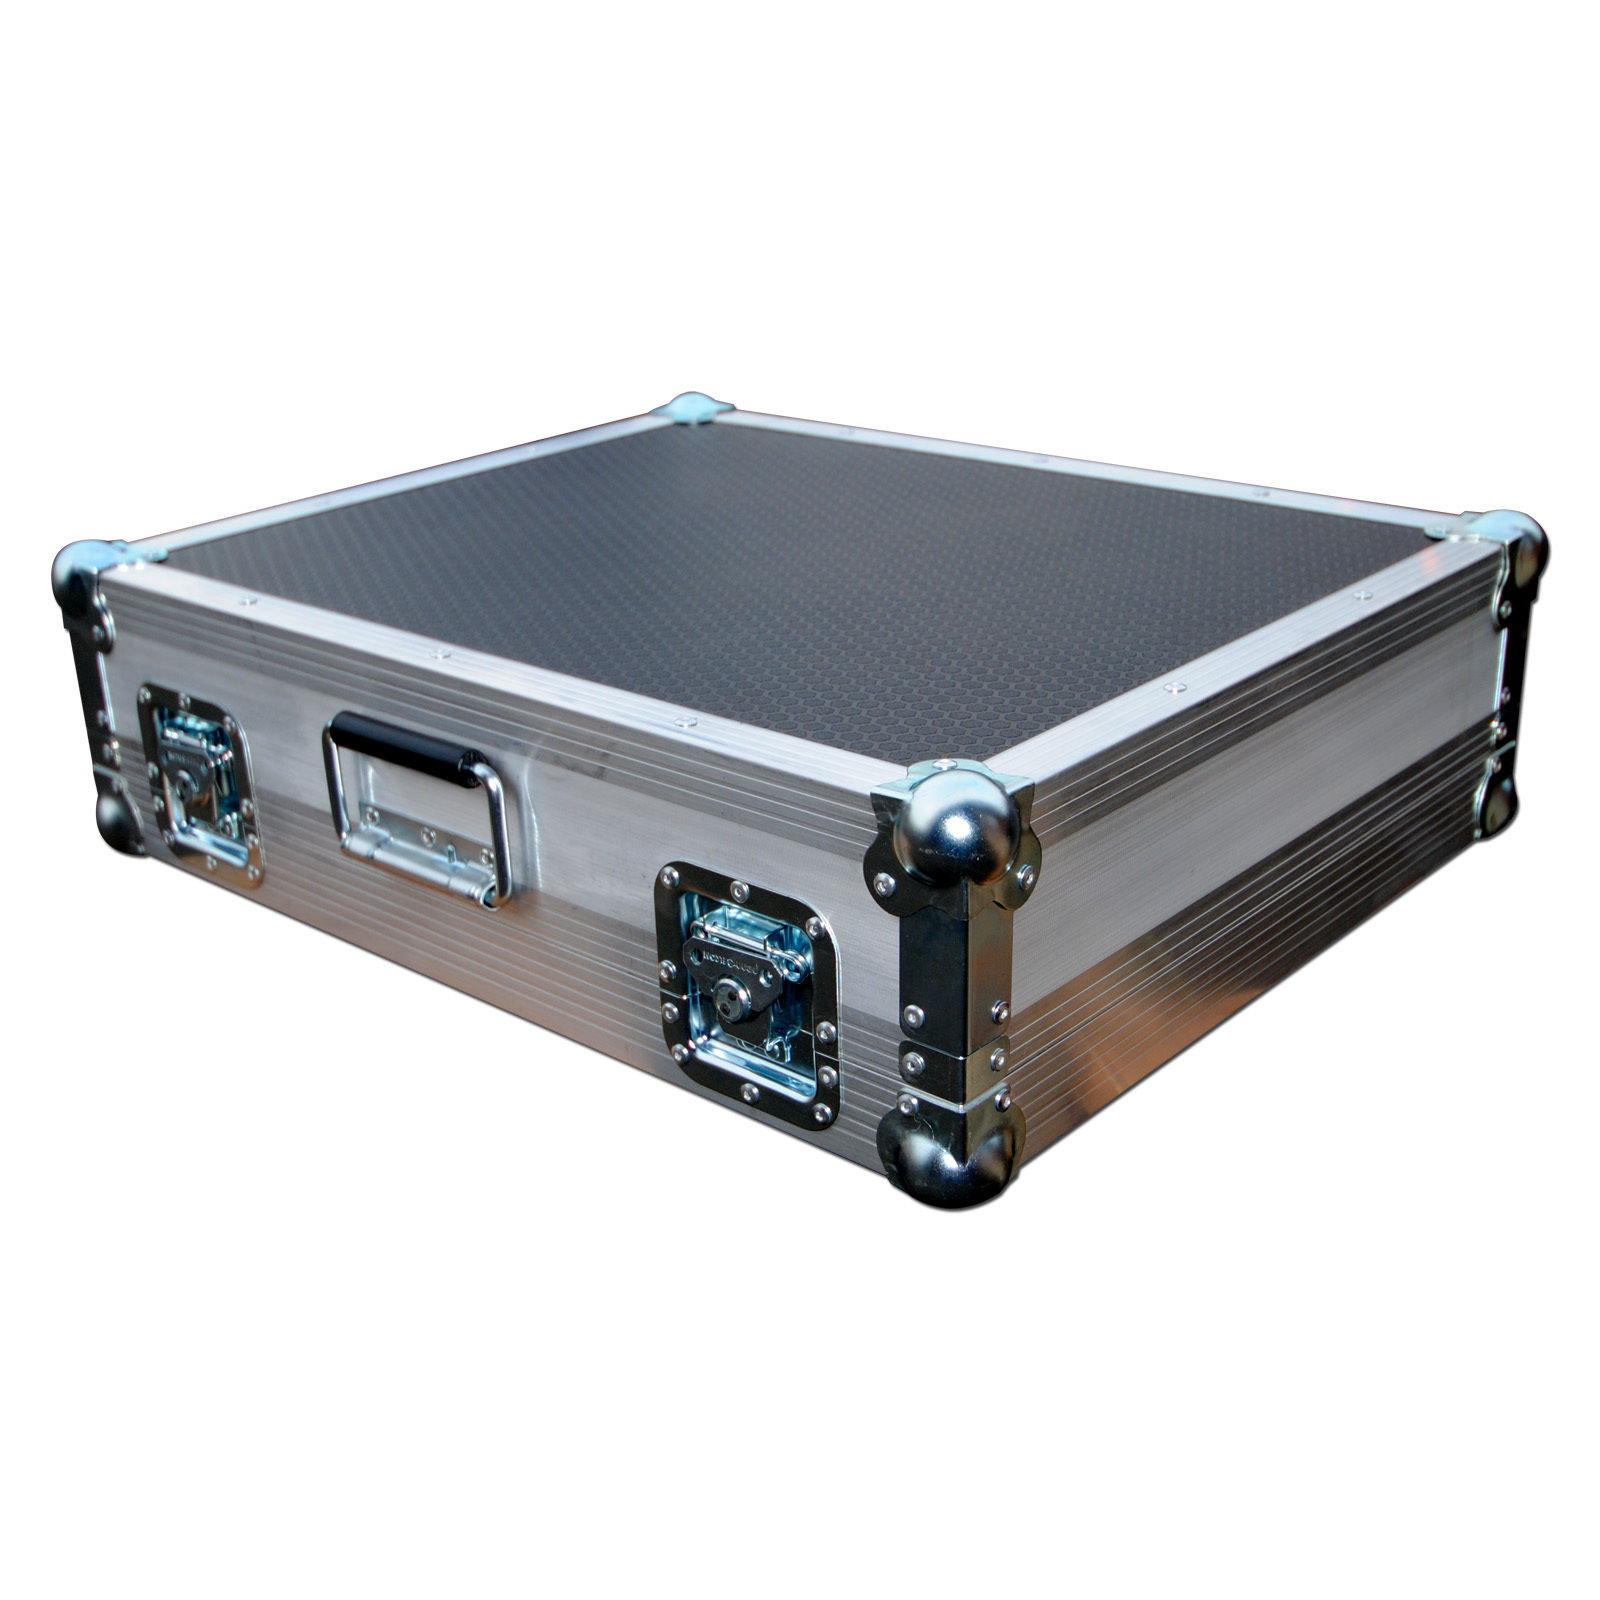 behringer mx 2442 mixer flight case. Black Bedroom Furniture Sets. Home Design Ideas